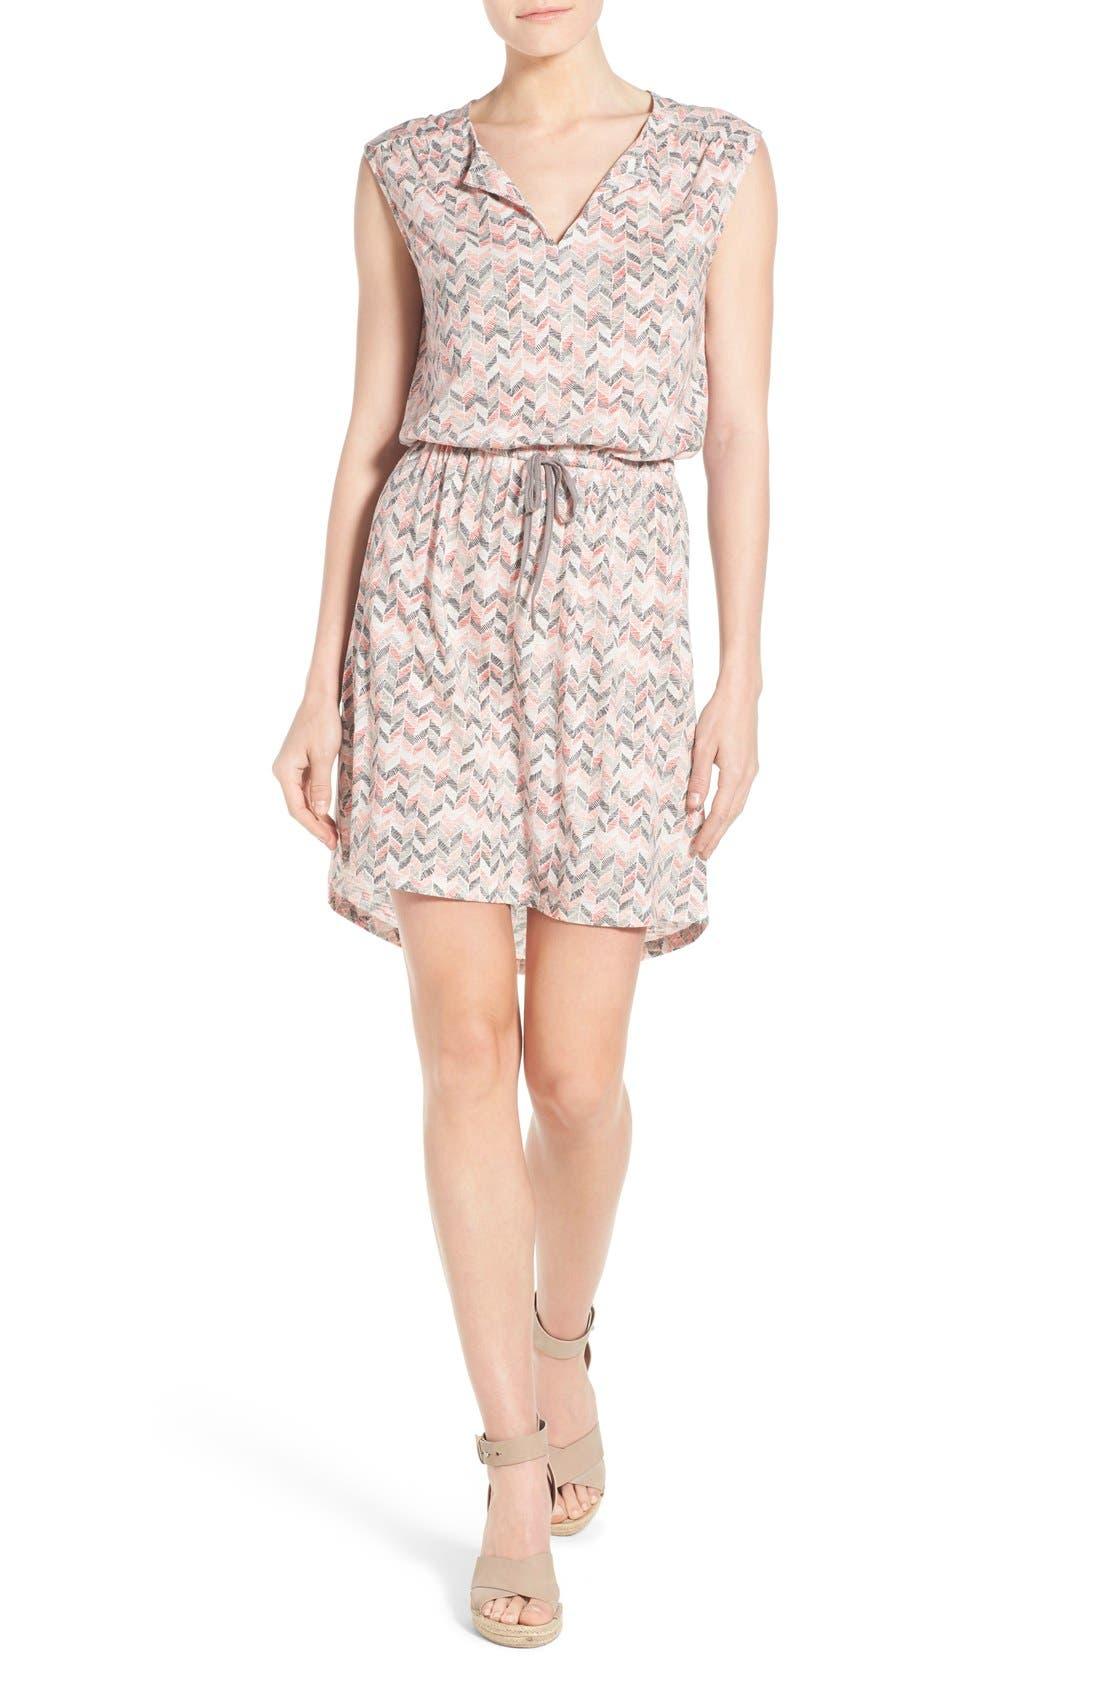 Alternate Image 1 Selected - Caslon® Split Neck Cotton & Modal Knit Blouson Dress (Regular & Petite)